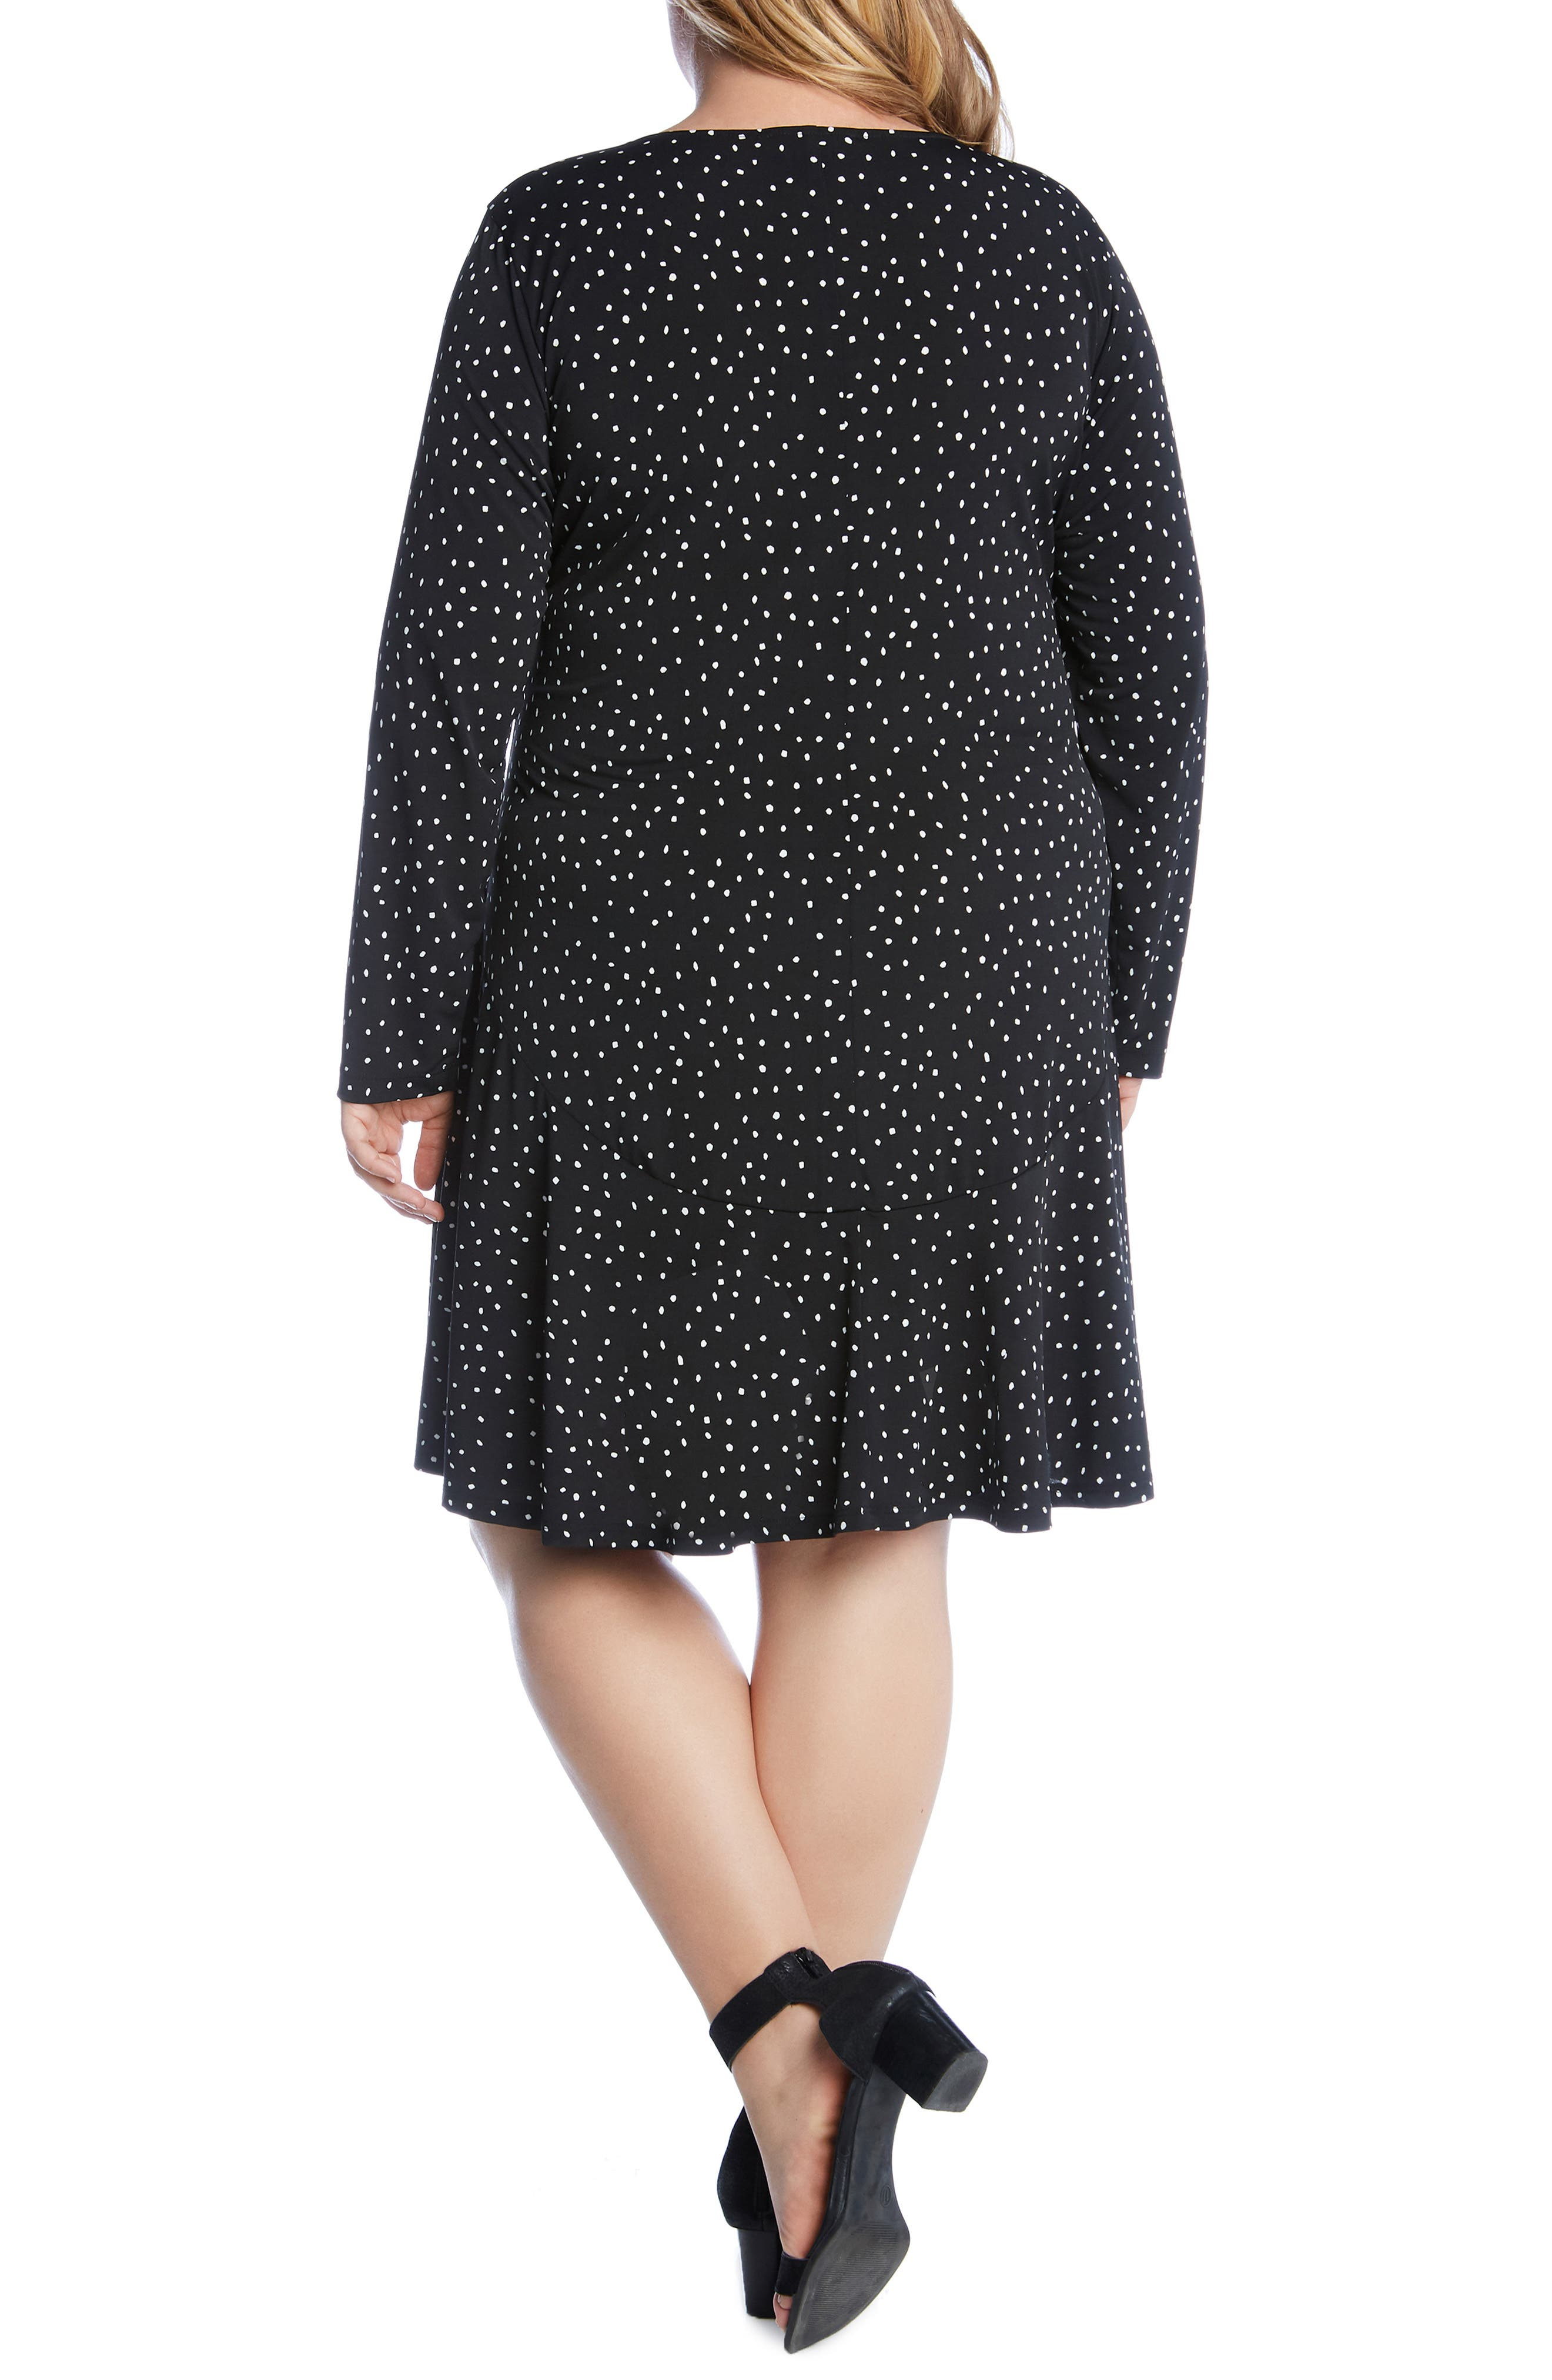 KAREN KANE, Dakota Dot Jersey A-Line Dress, Alternate thumbnail 2, color, DOT